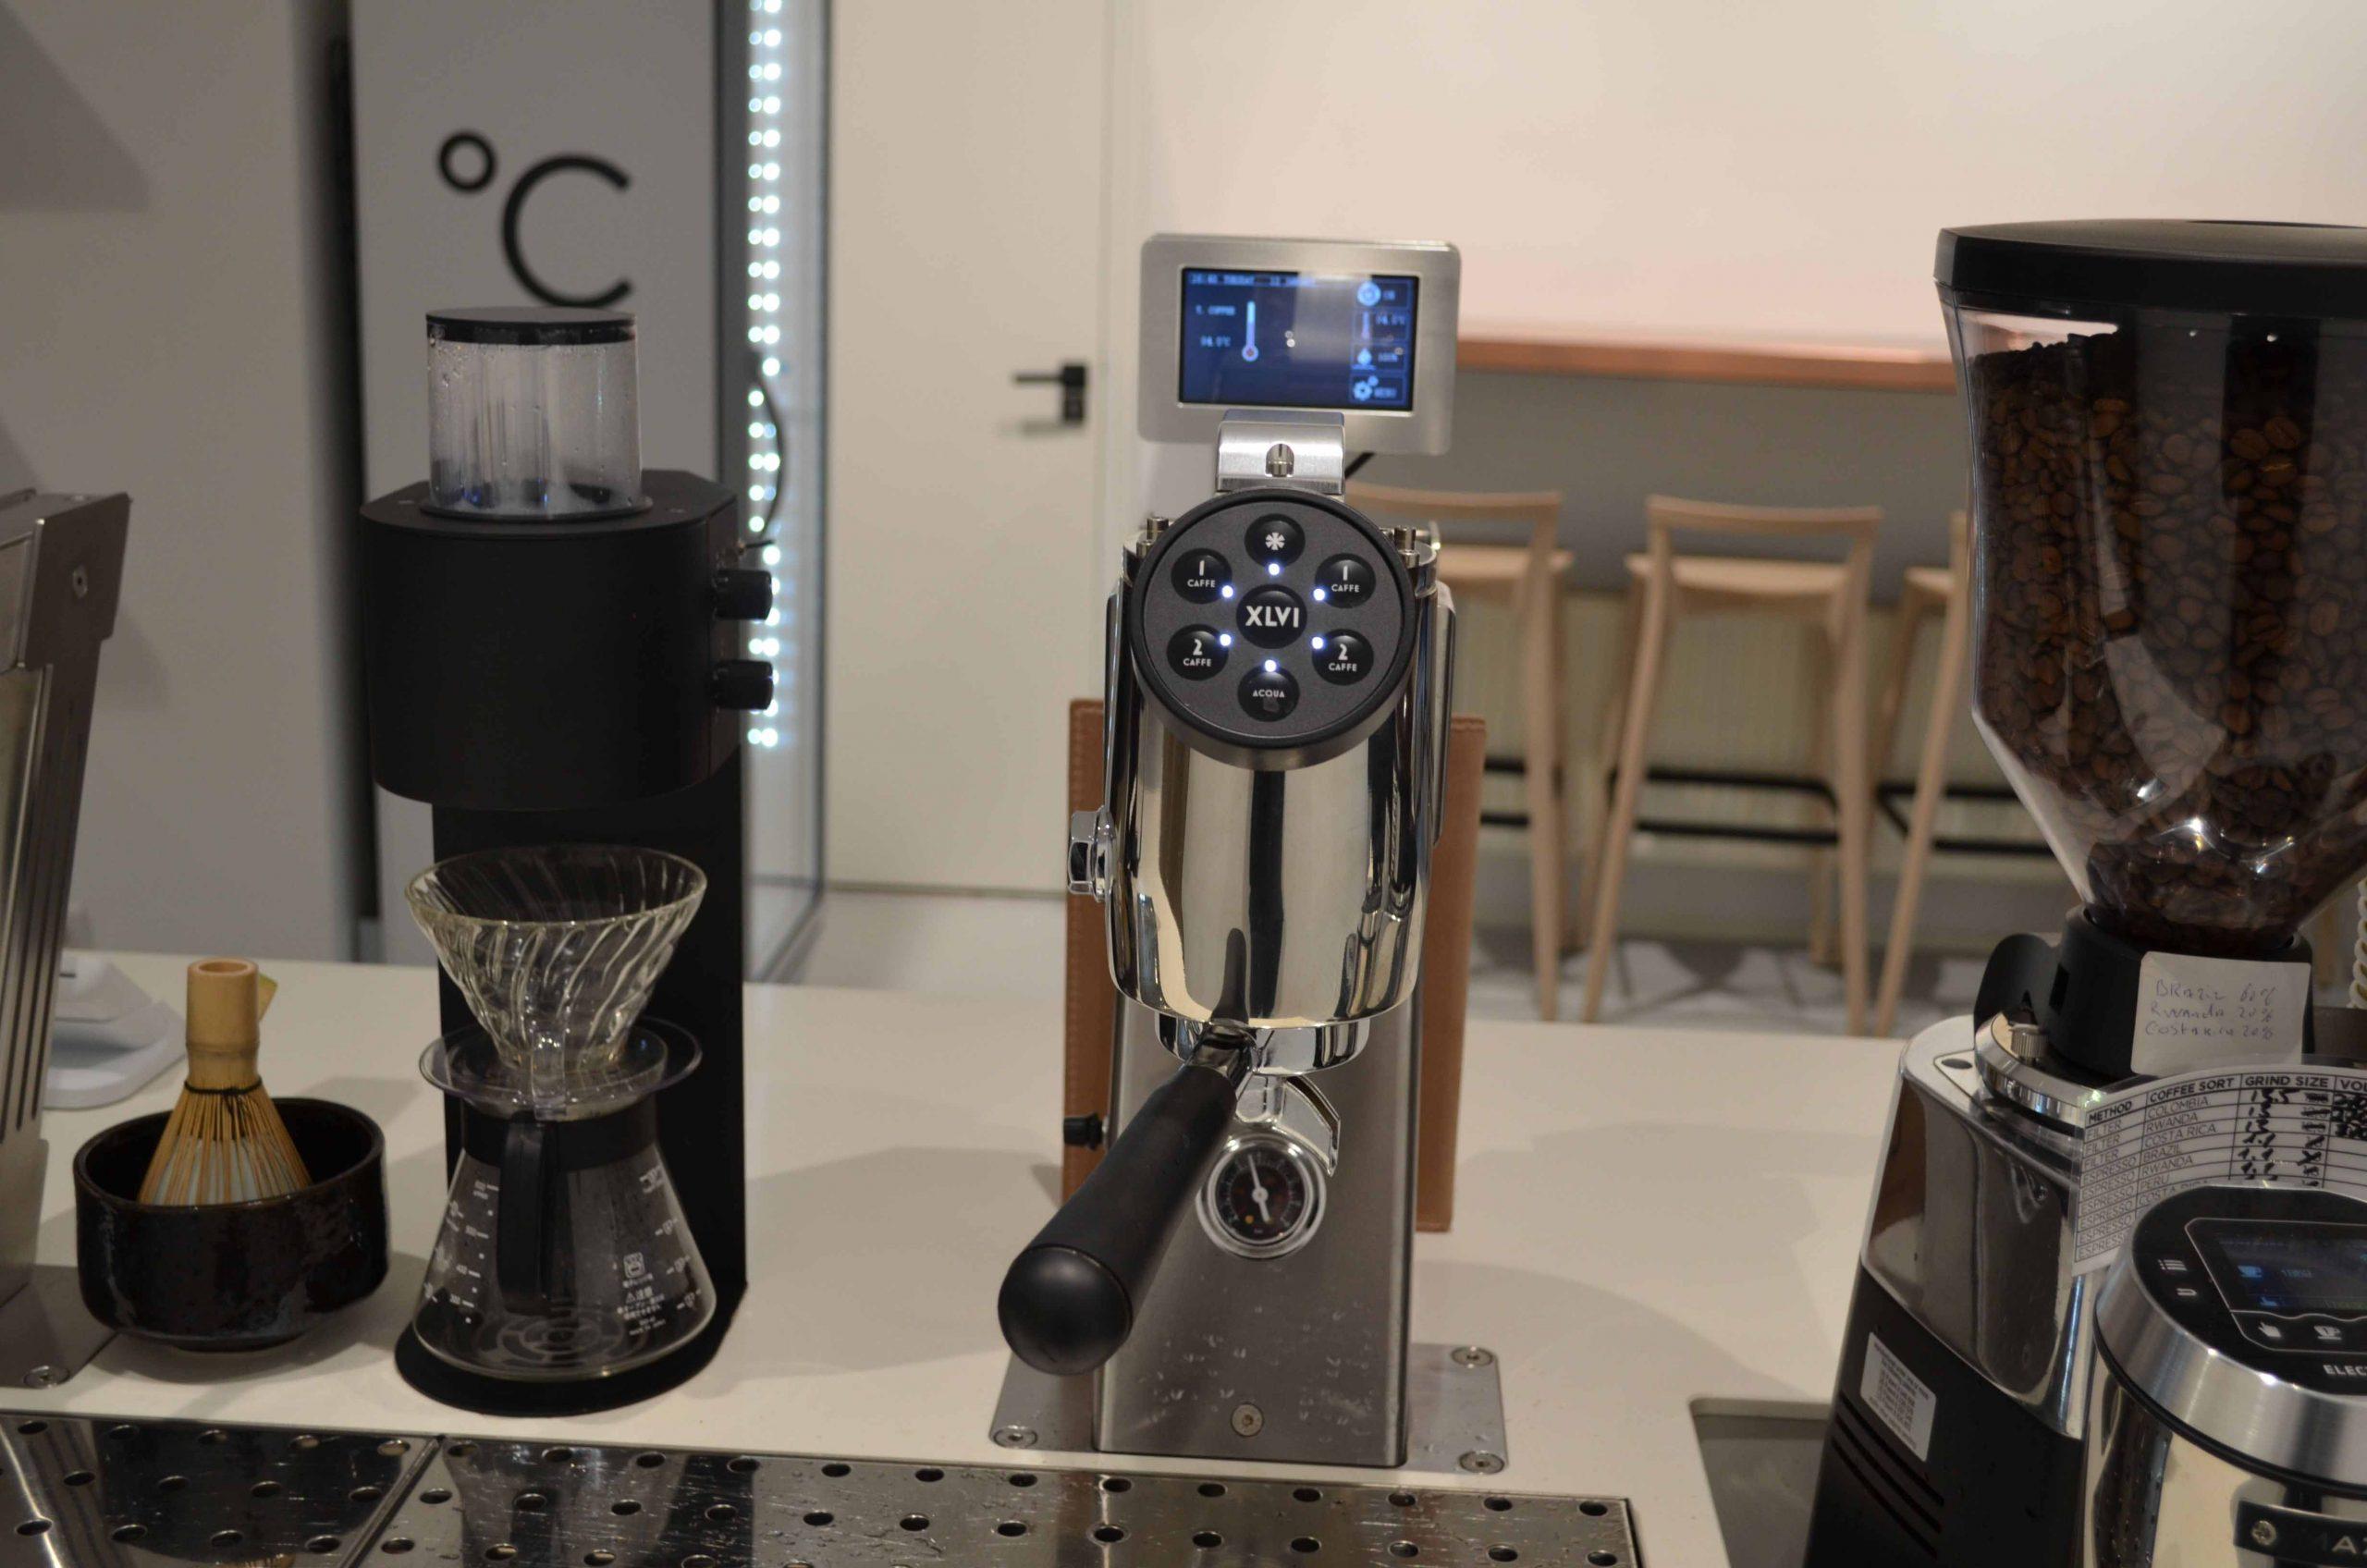 Koffiebar Amsterdam, koffie filter apparaten